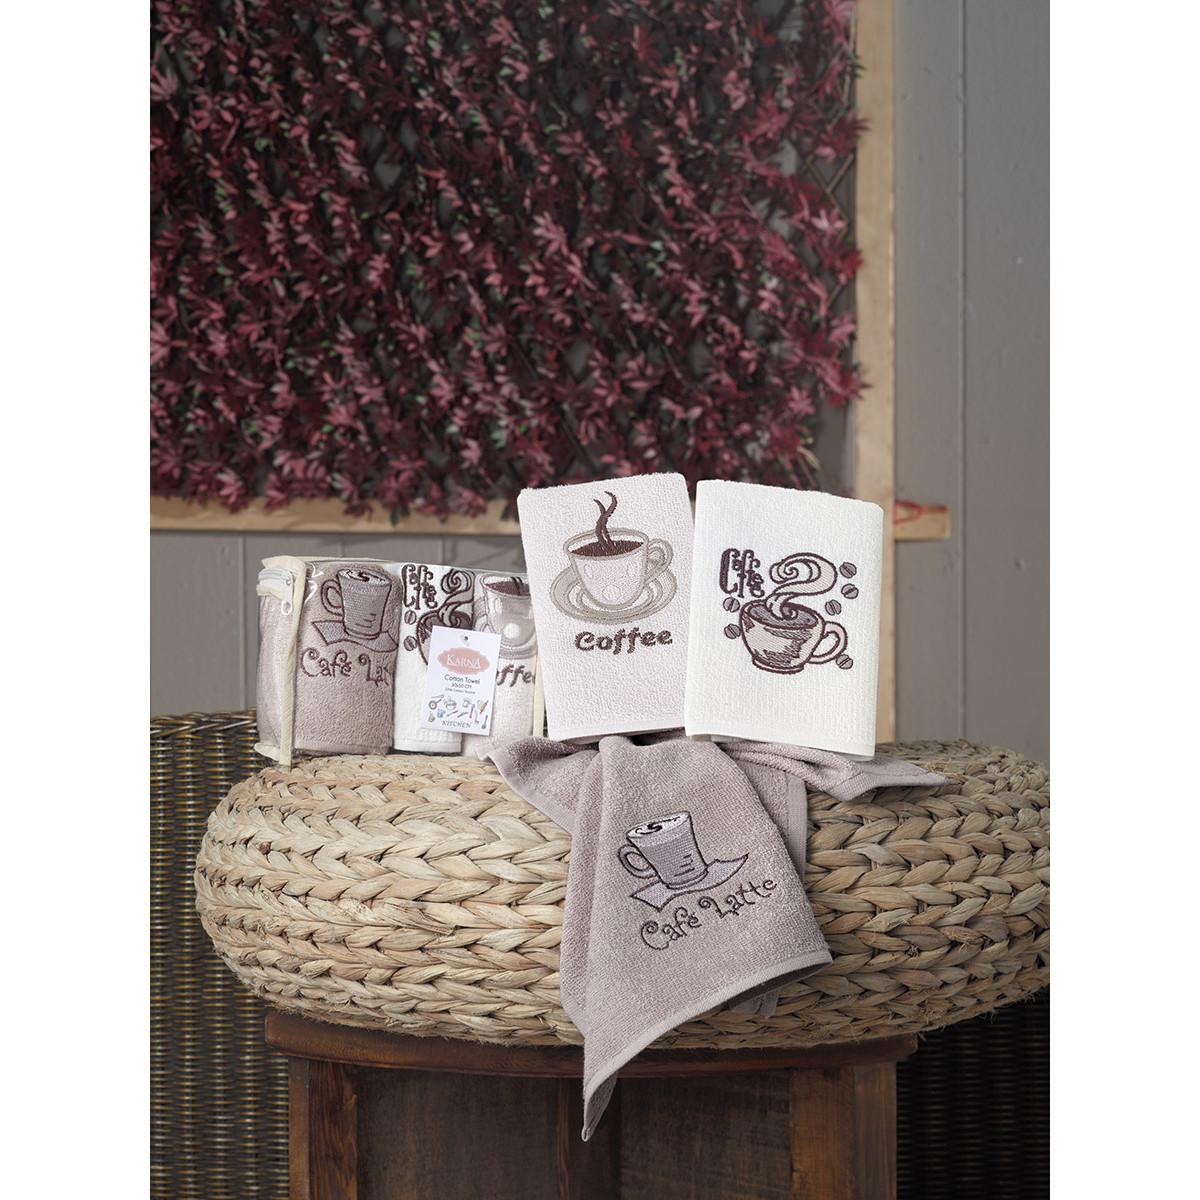 Набор кухонных полотенец Karna Cafe Prima, 50x30 см, темно-бежевый, бежевый